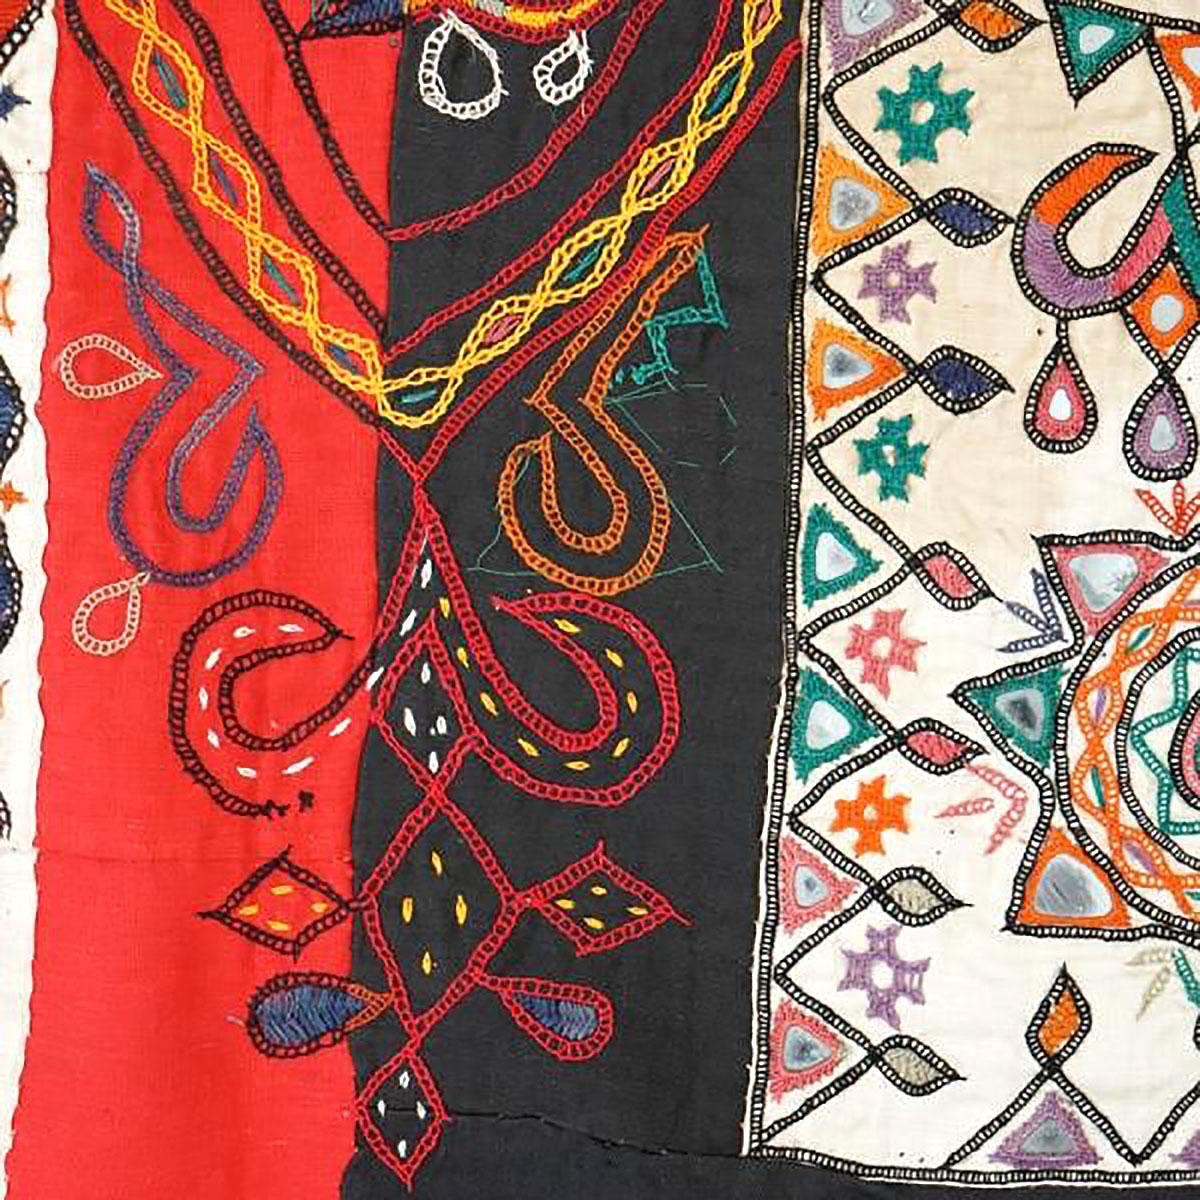 Kutch panel, close-up